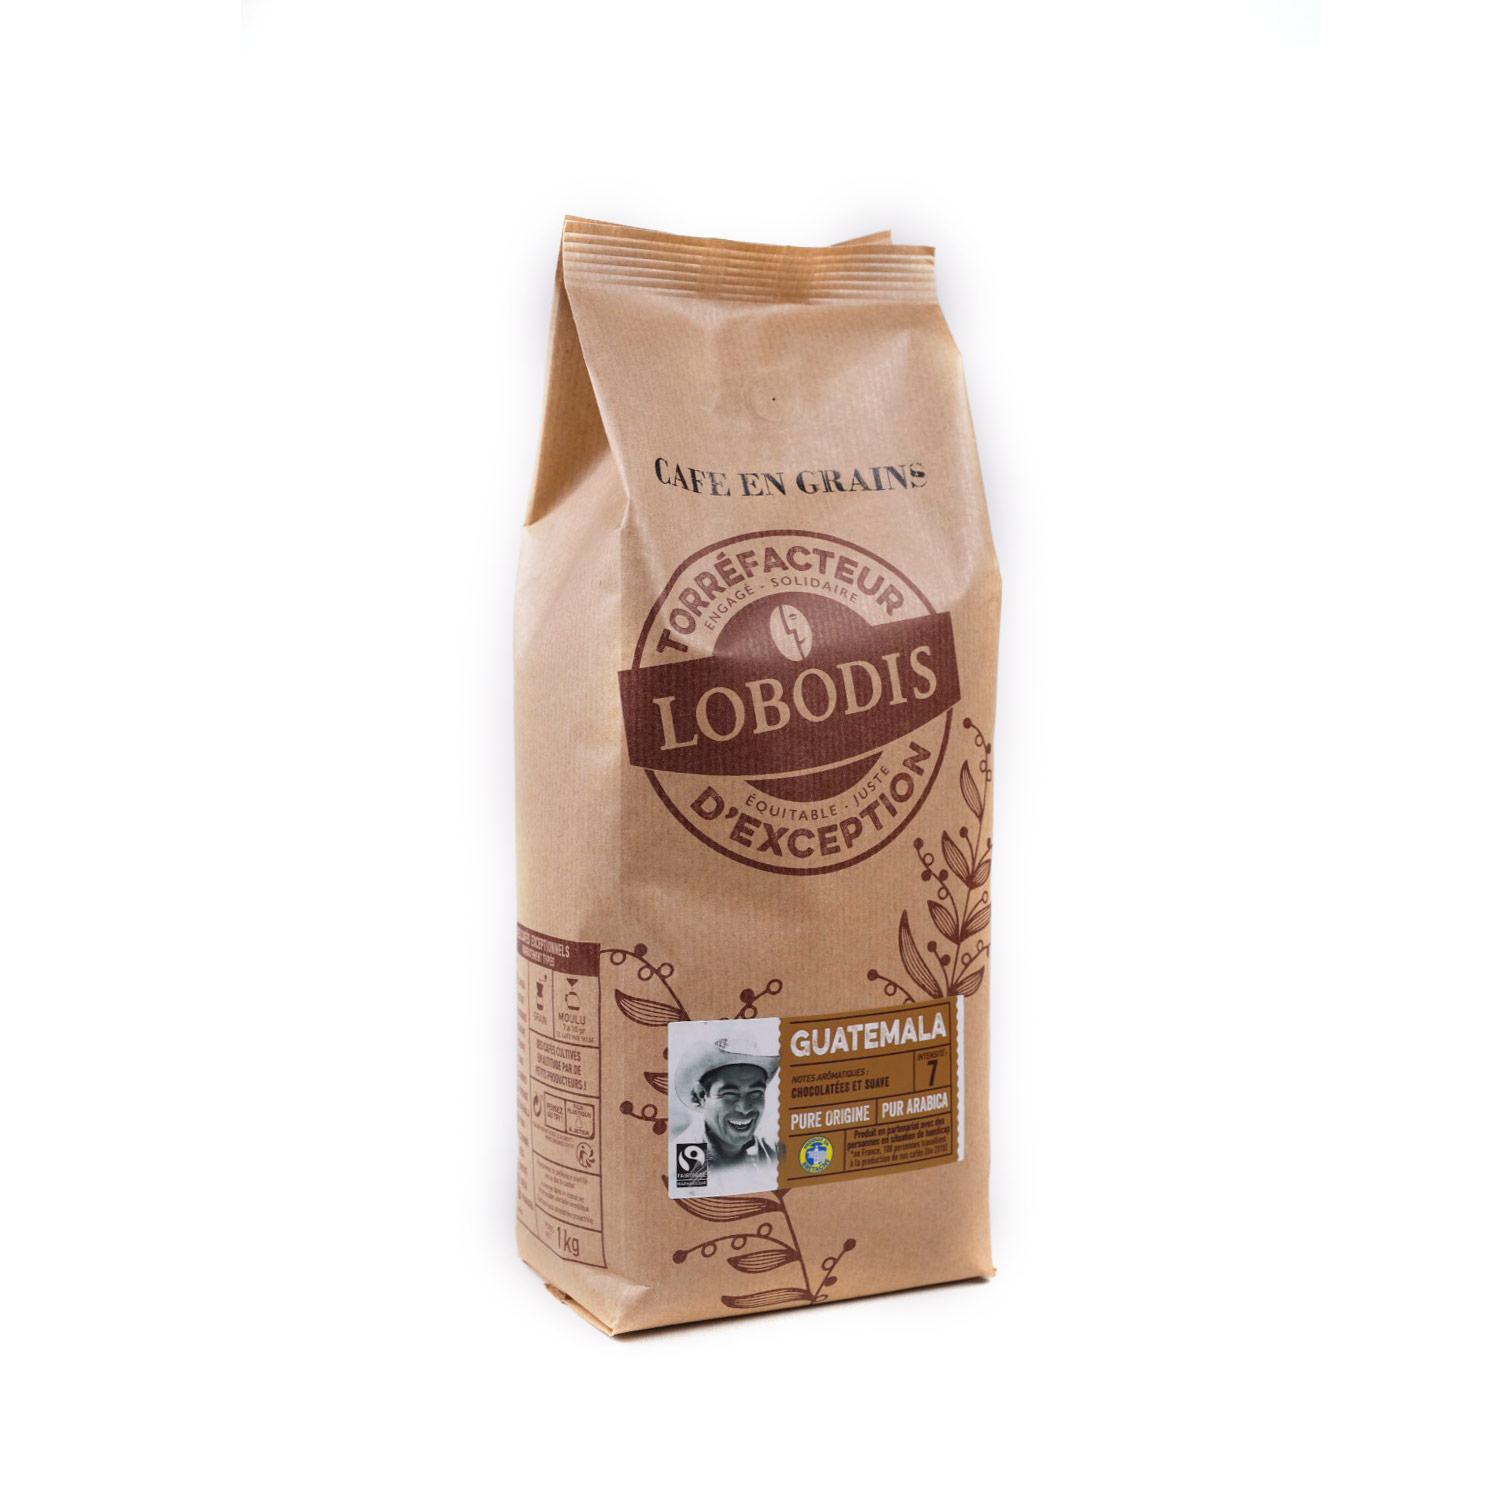 Guatemala reilun kaupan Pure Origine kahvipapu 1kg